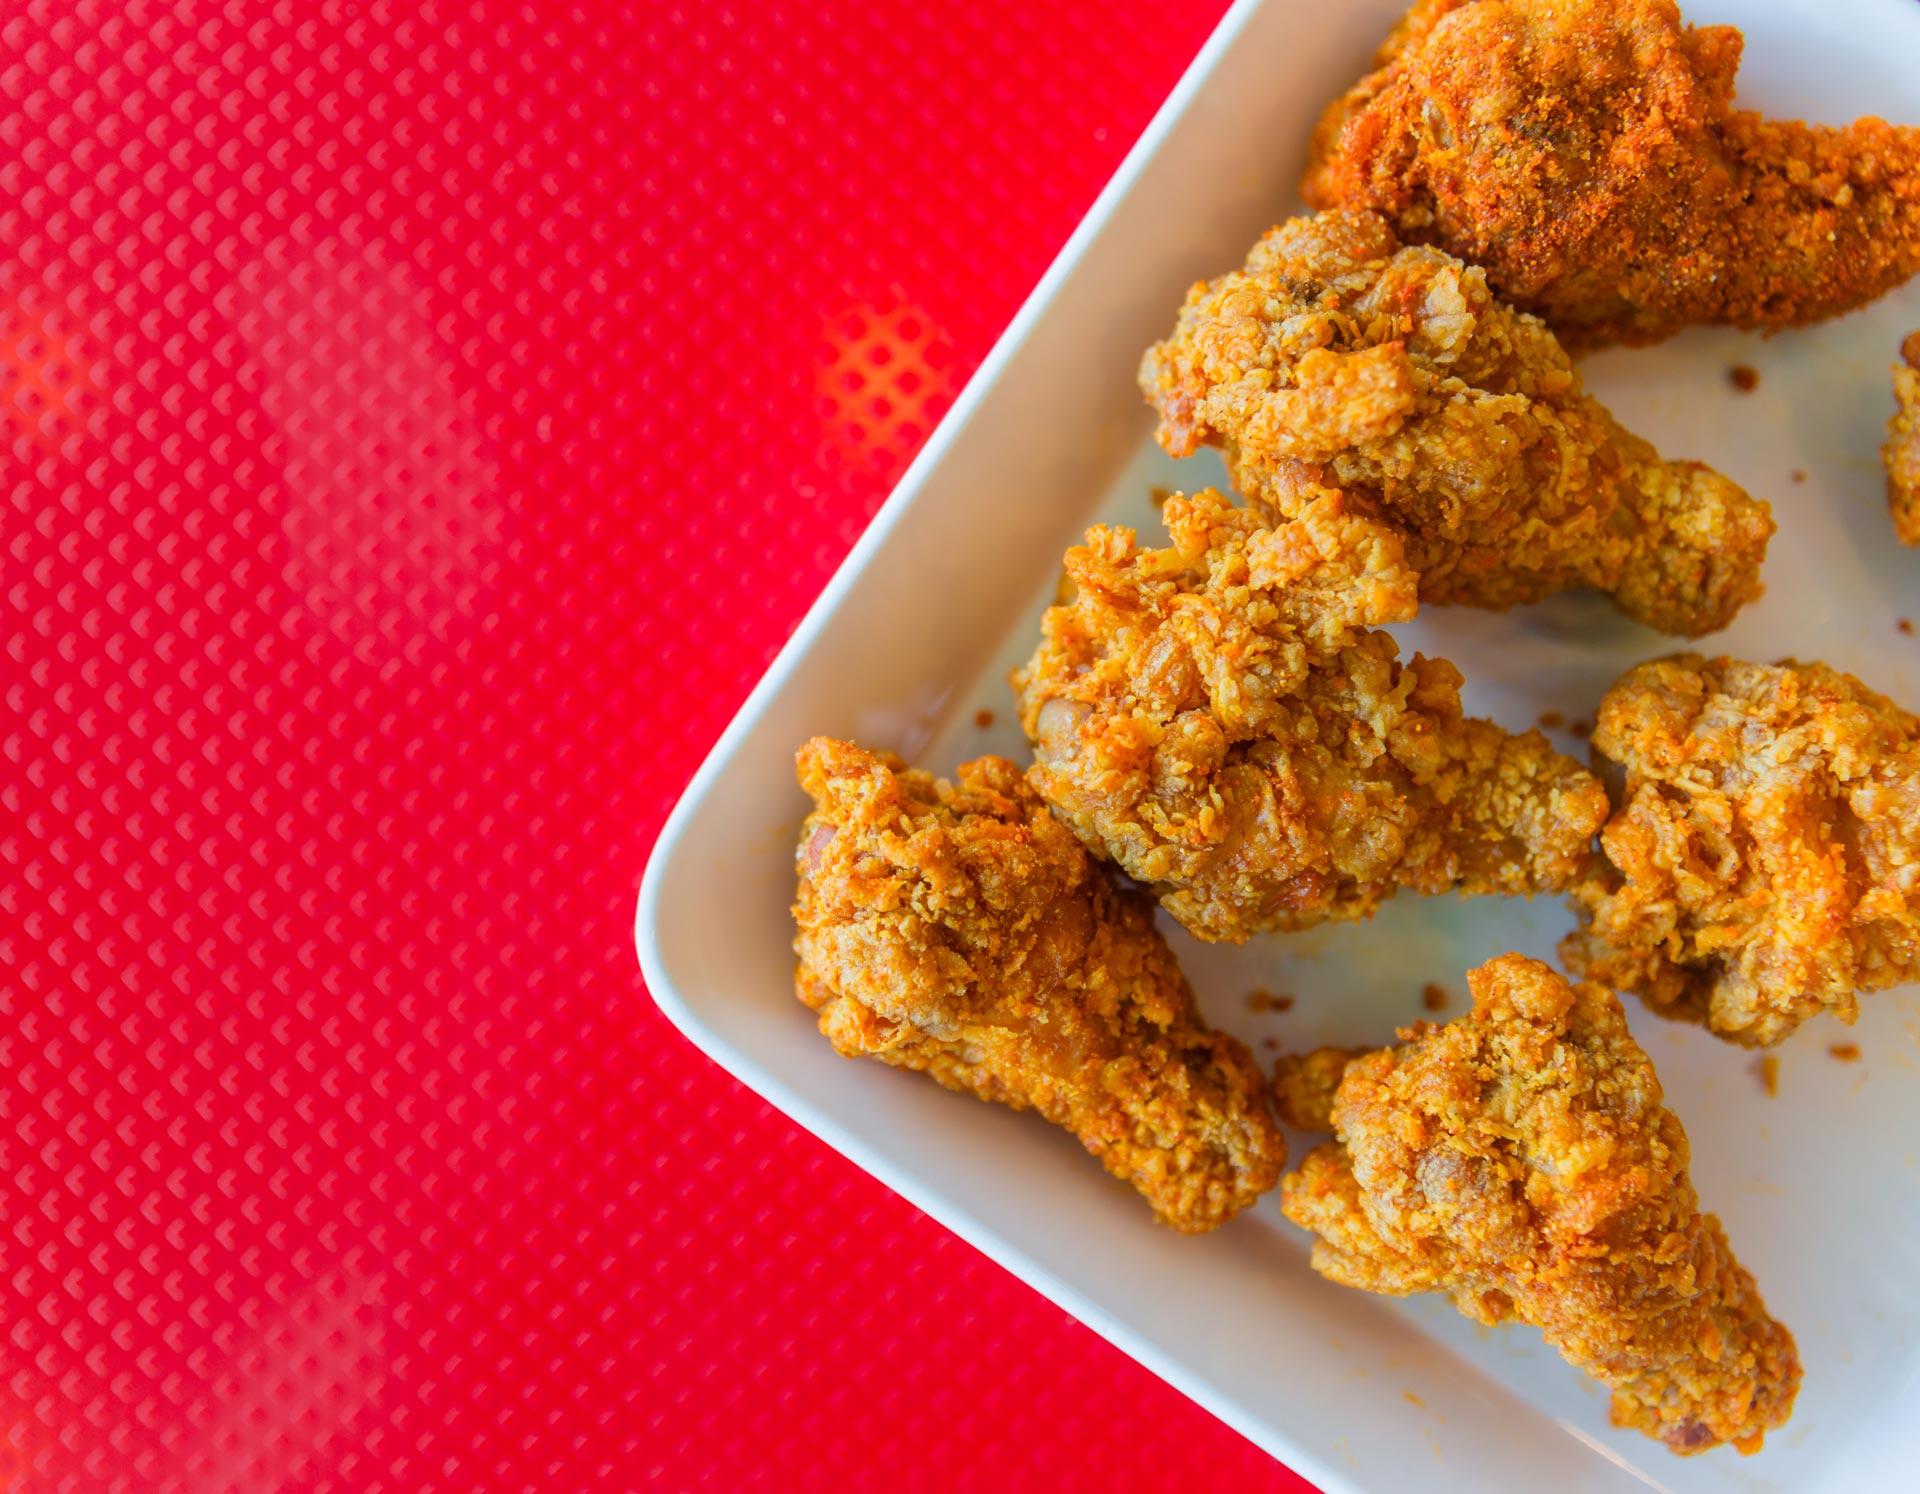 KFC upgrades tech behind the chicken to meet growing digital demand